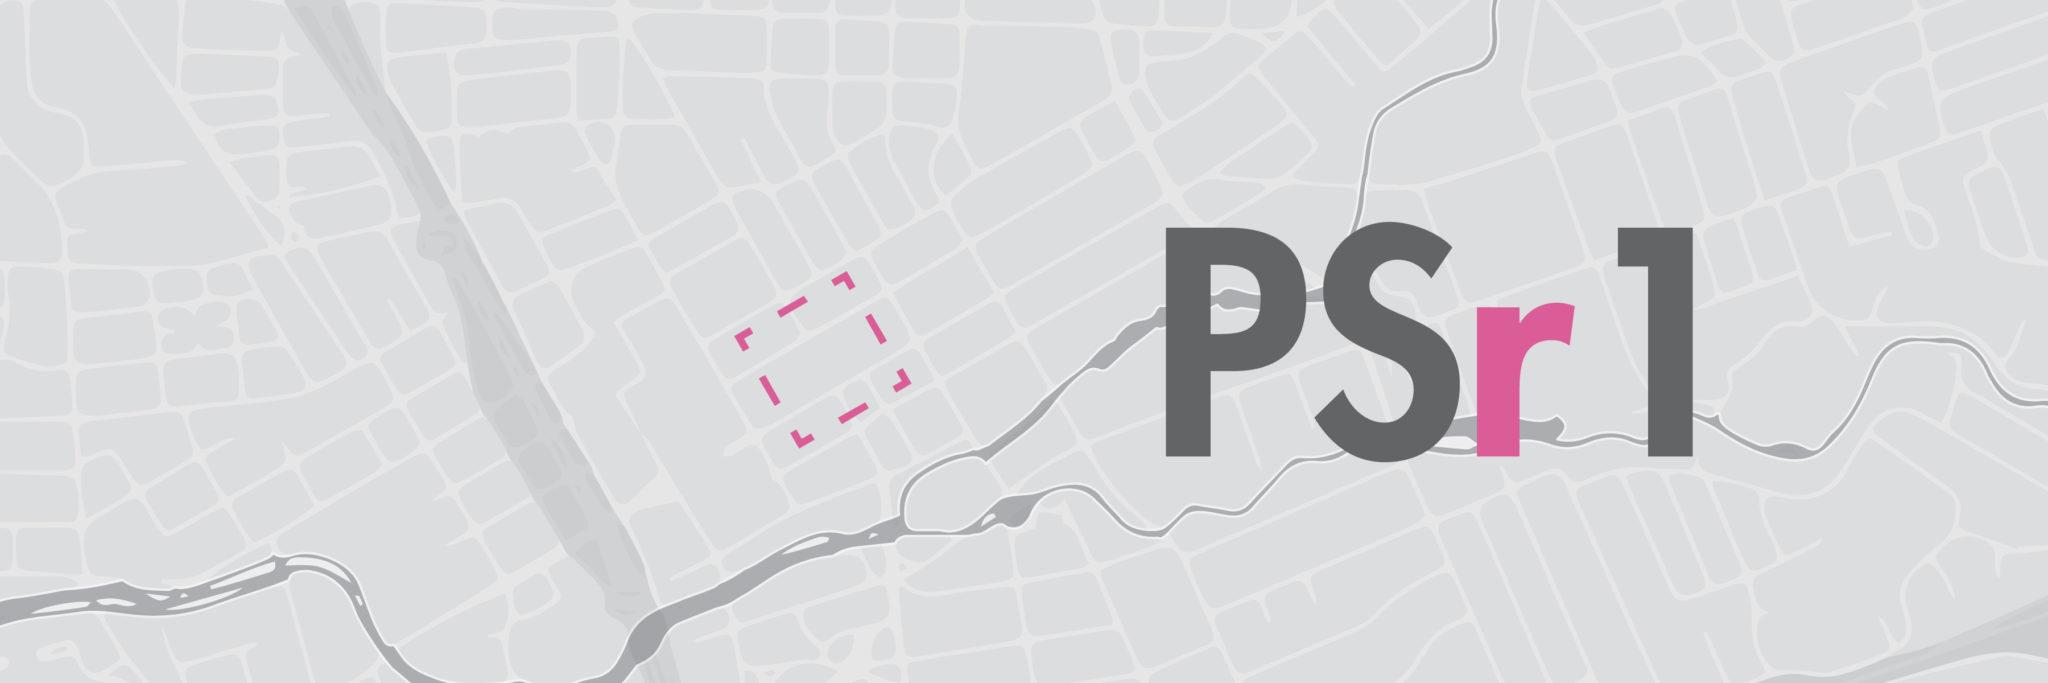 PSr1 Design-Build Competition Installation Exhibit